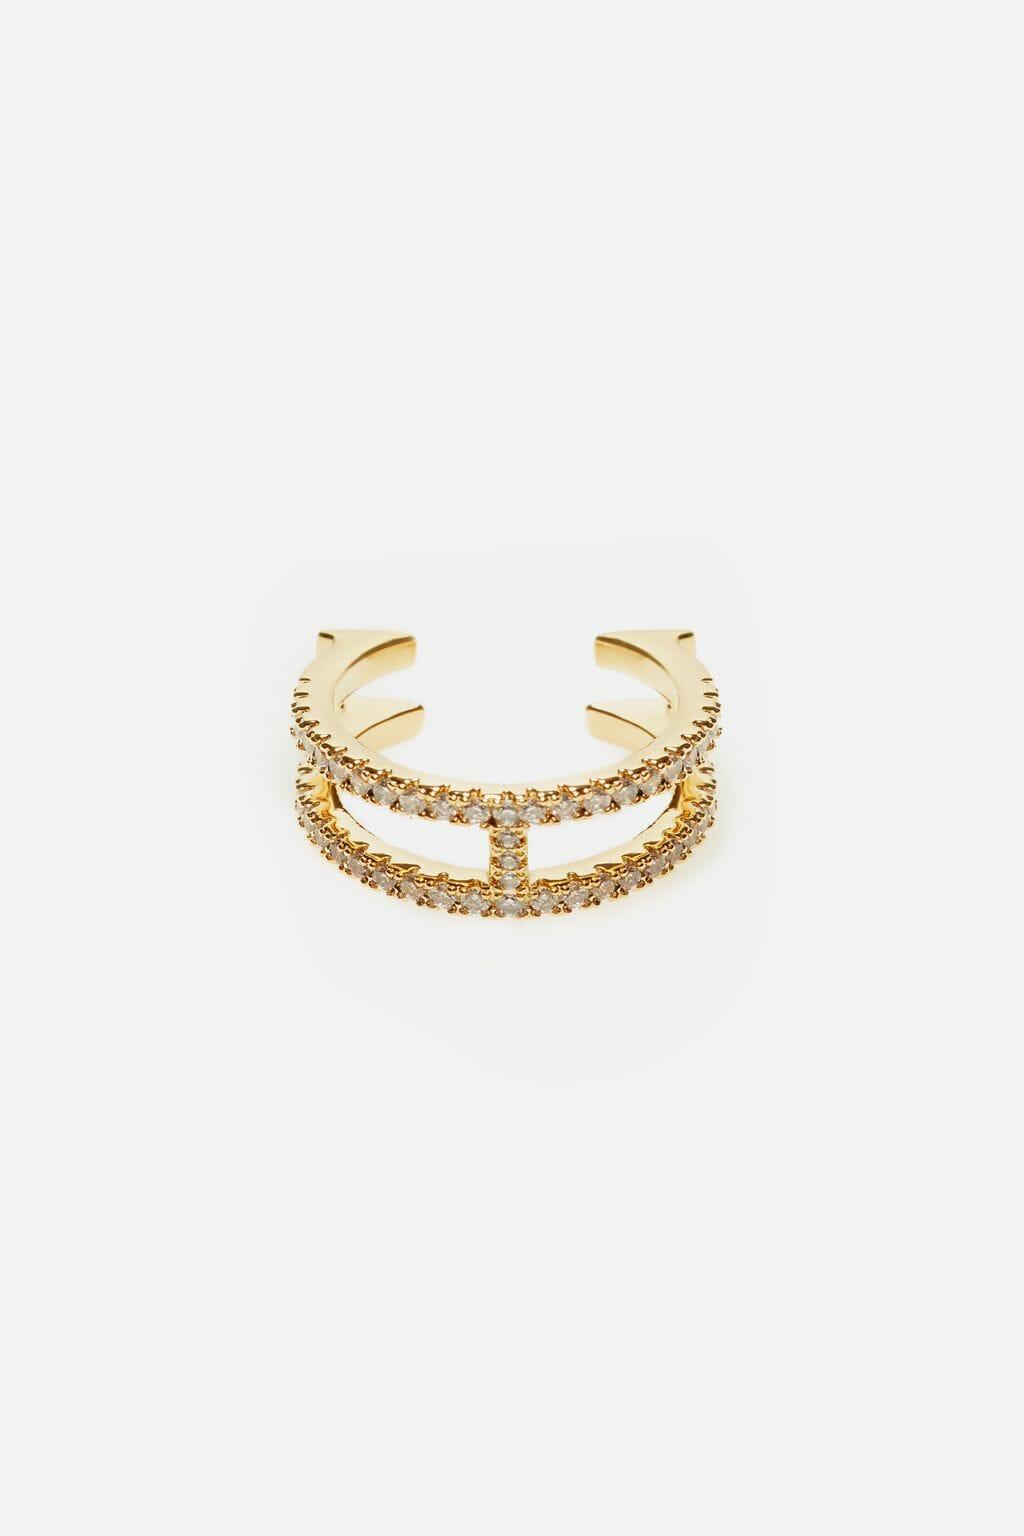 CH-Carolina-herrera-insignia-jewelry-look-28